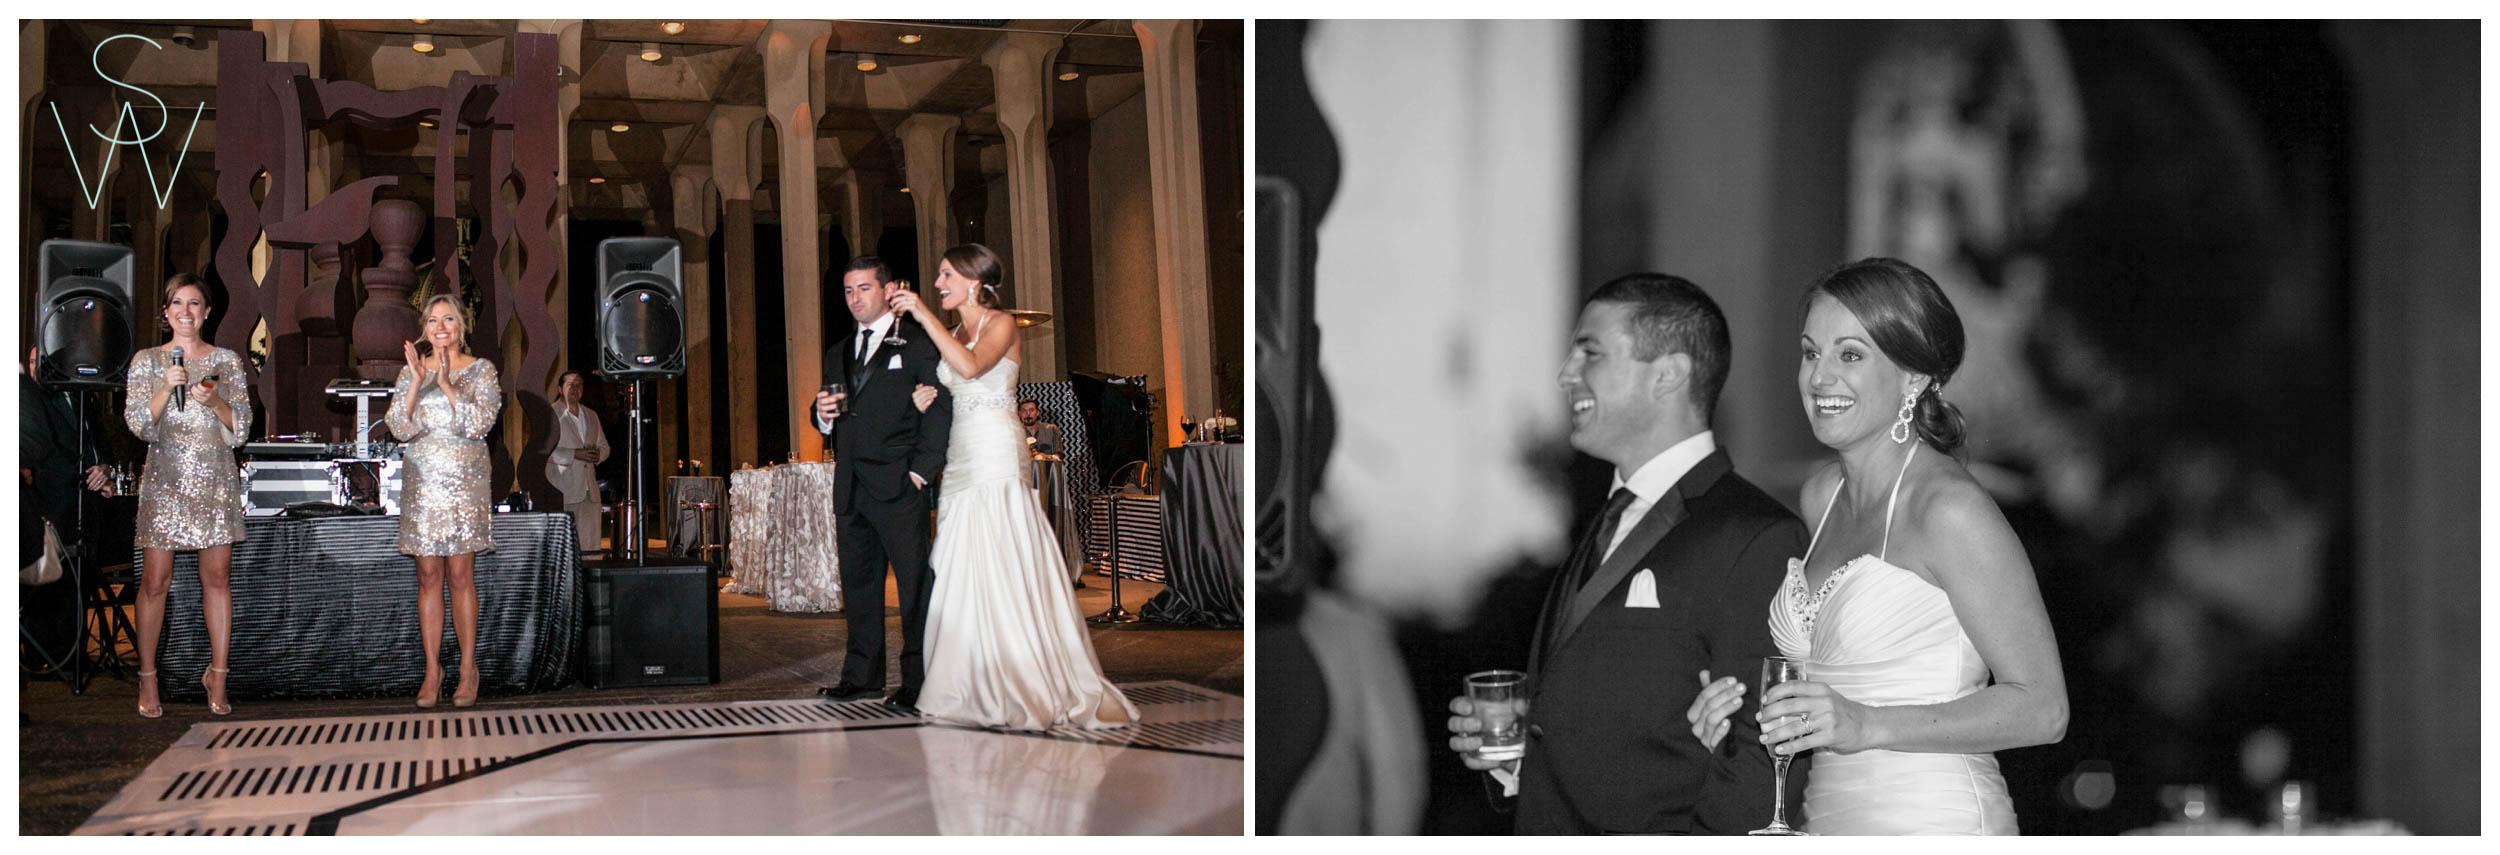 Shewanders.sdma_.wedding.photography-1089.jpg.wedding.photography-1089.jpg